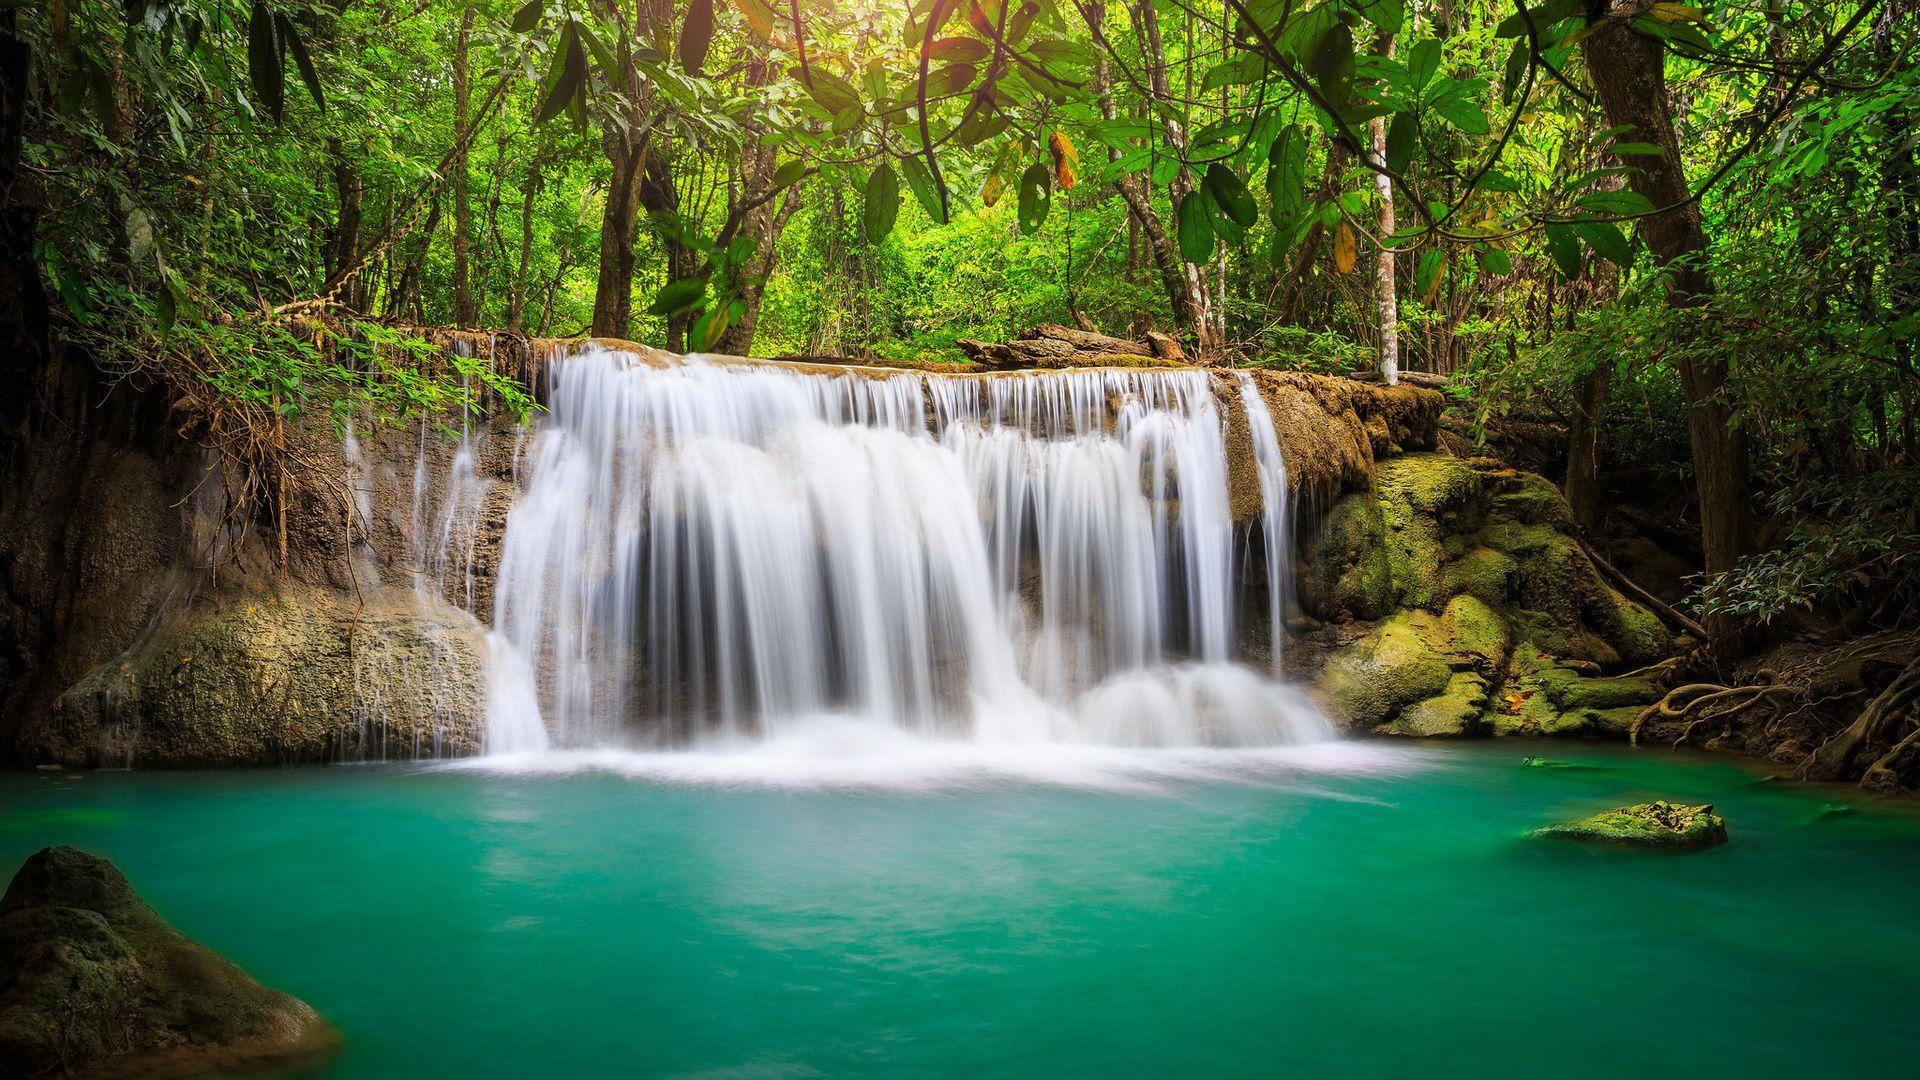 Nature Photo Hd desktop image